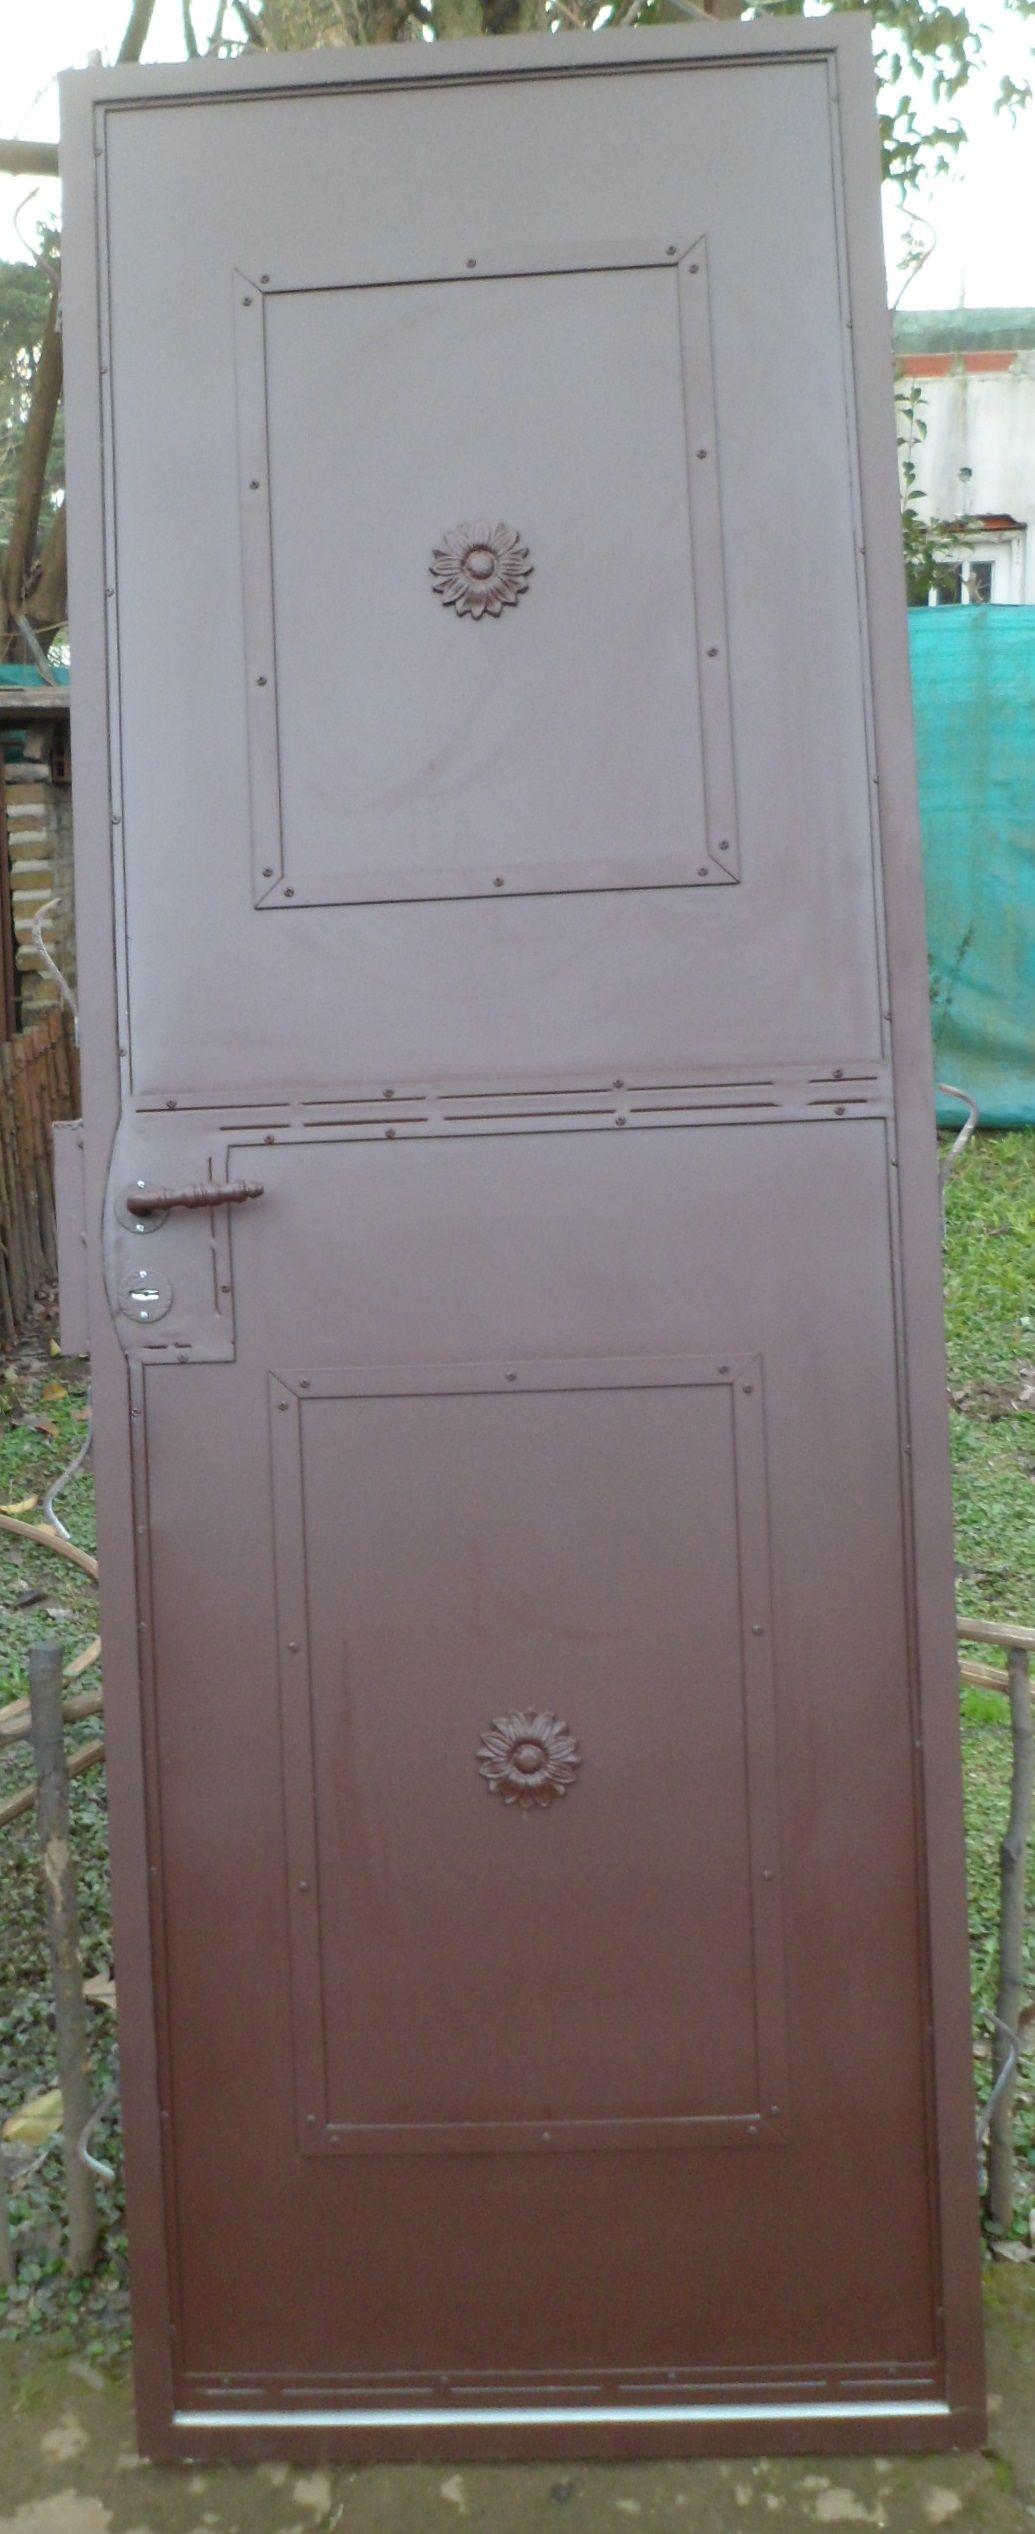 Puerta simple de chapa con marco 0,70 m x h 2,00 m | www ...